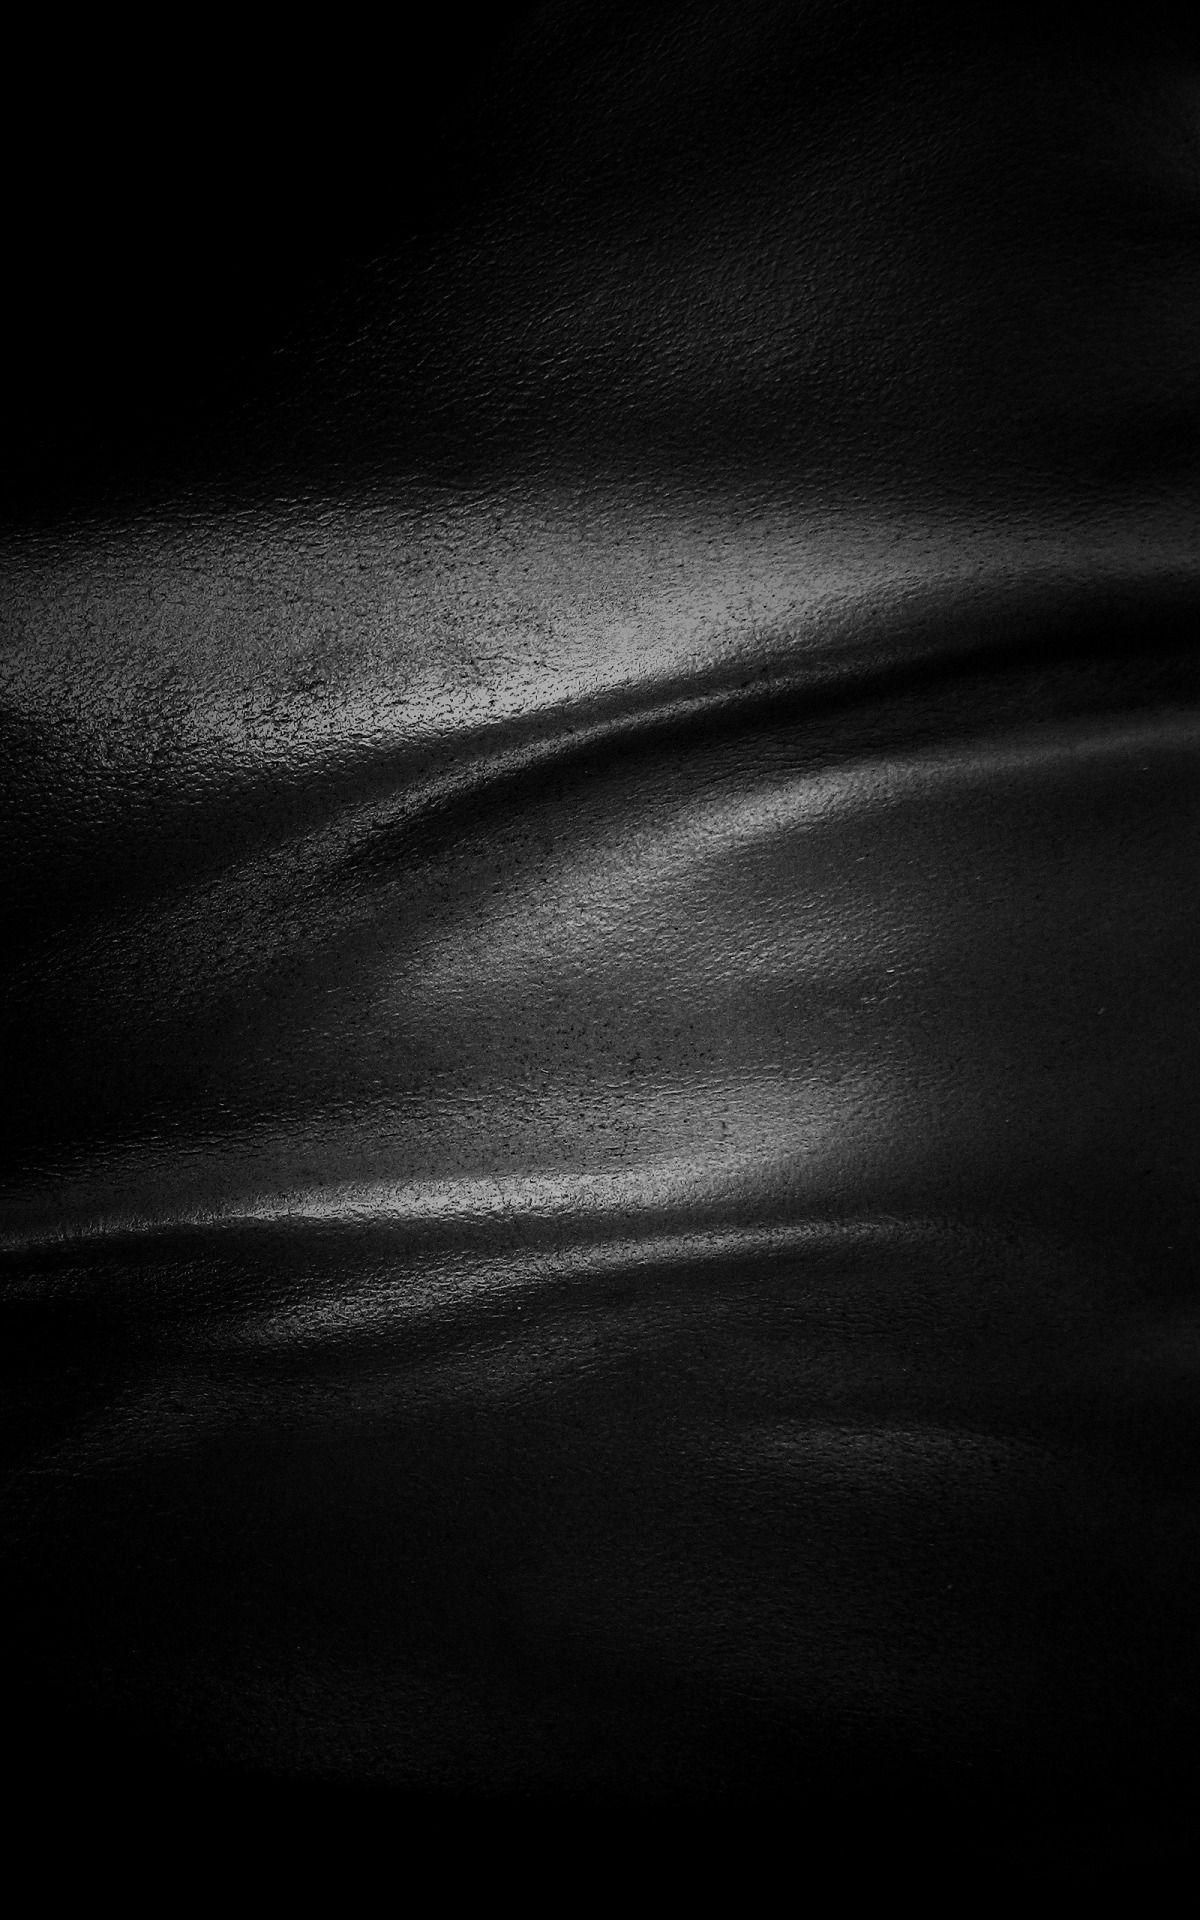 974c54a8b09a Black Leather Texture. Soft. Beautiful.  italianleather   RarePear ...